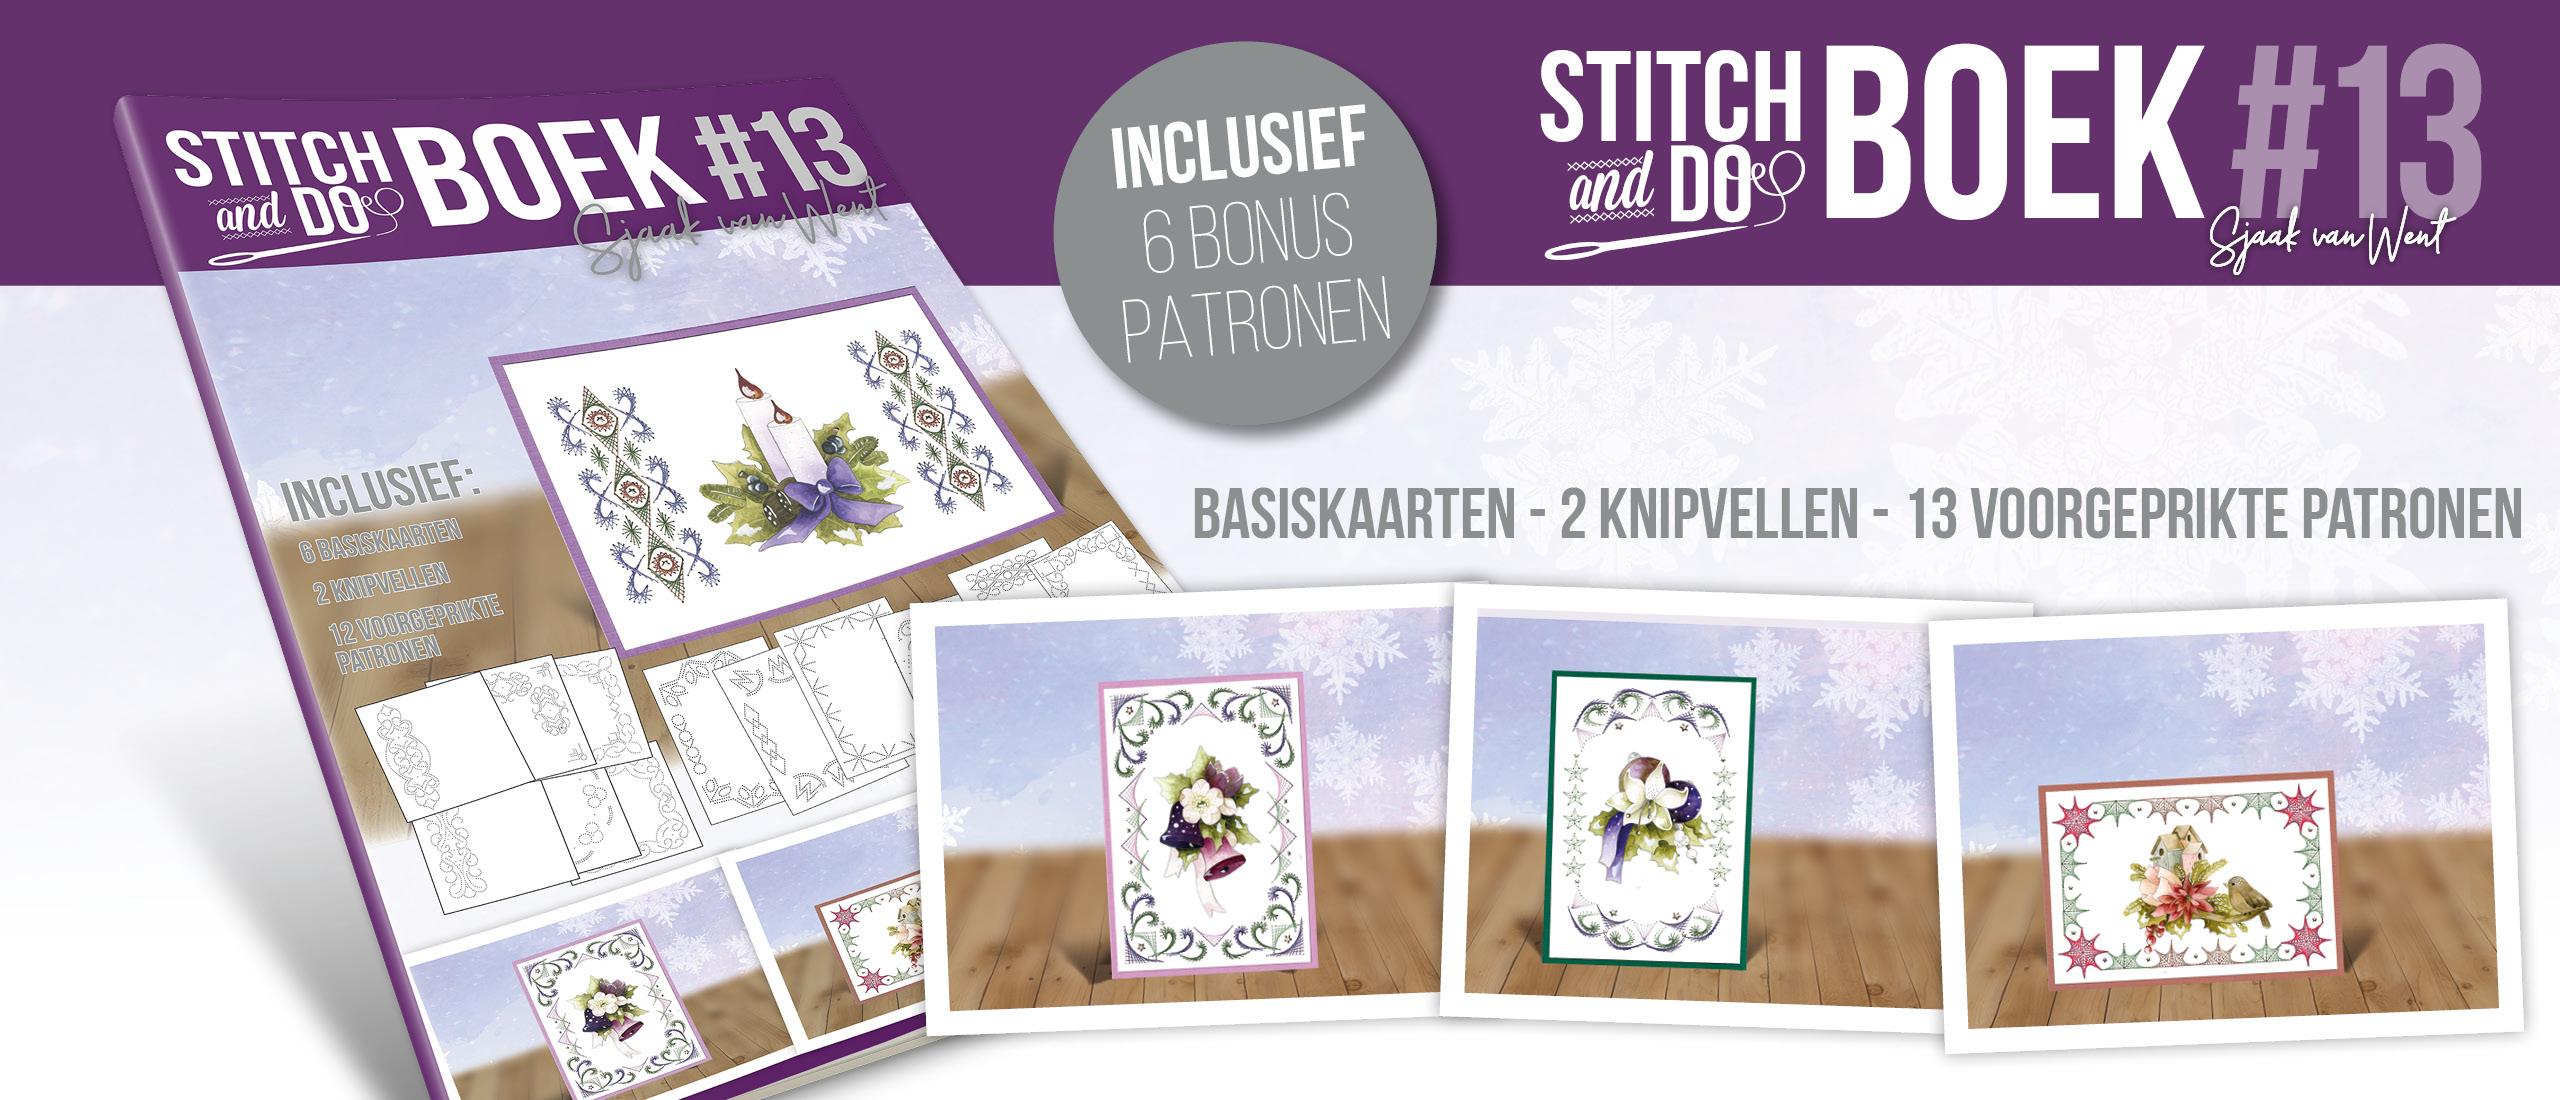 Stitch and do Book 13 - Sjaak van Went